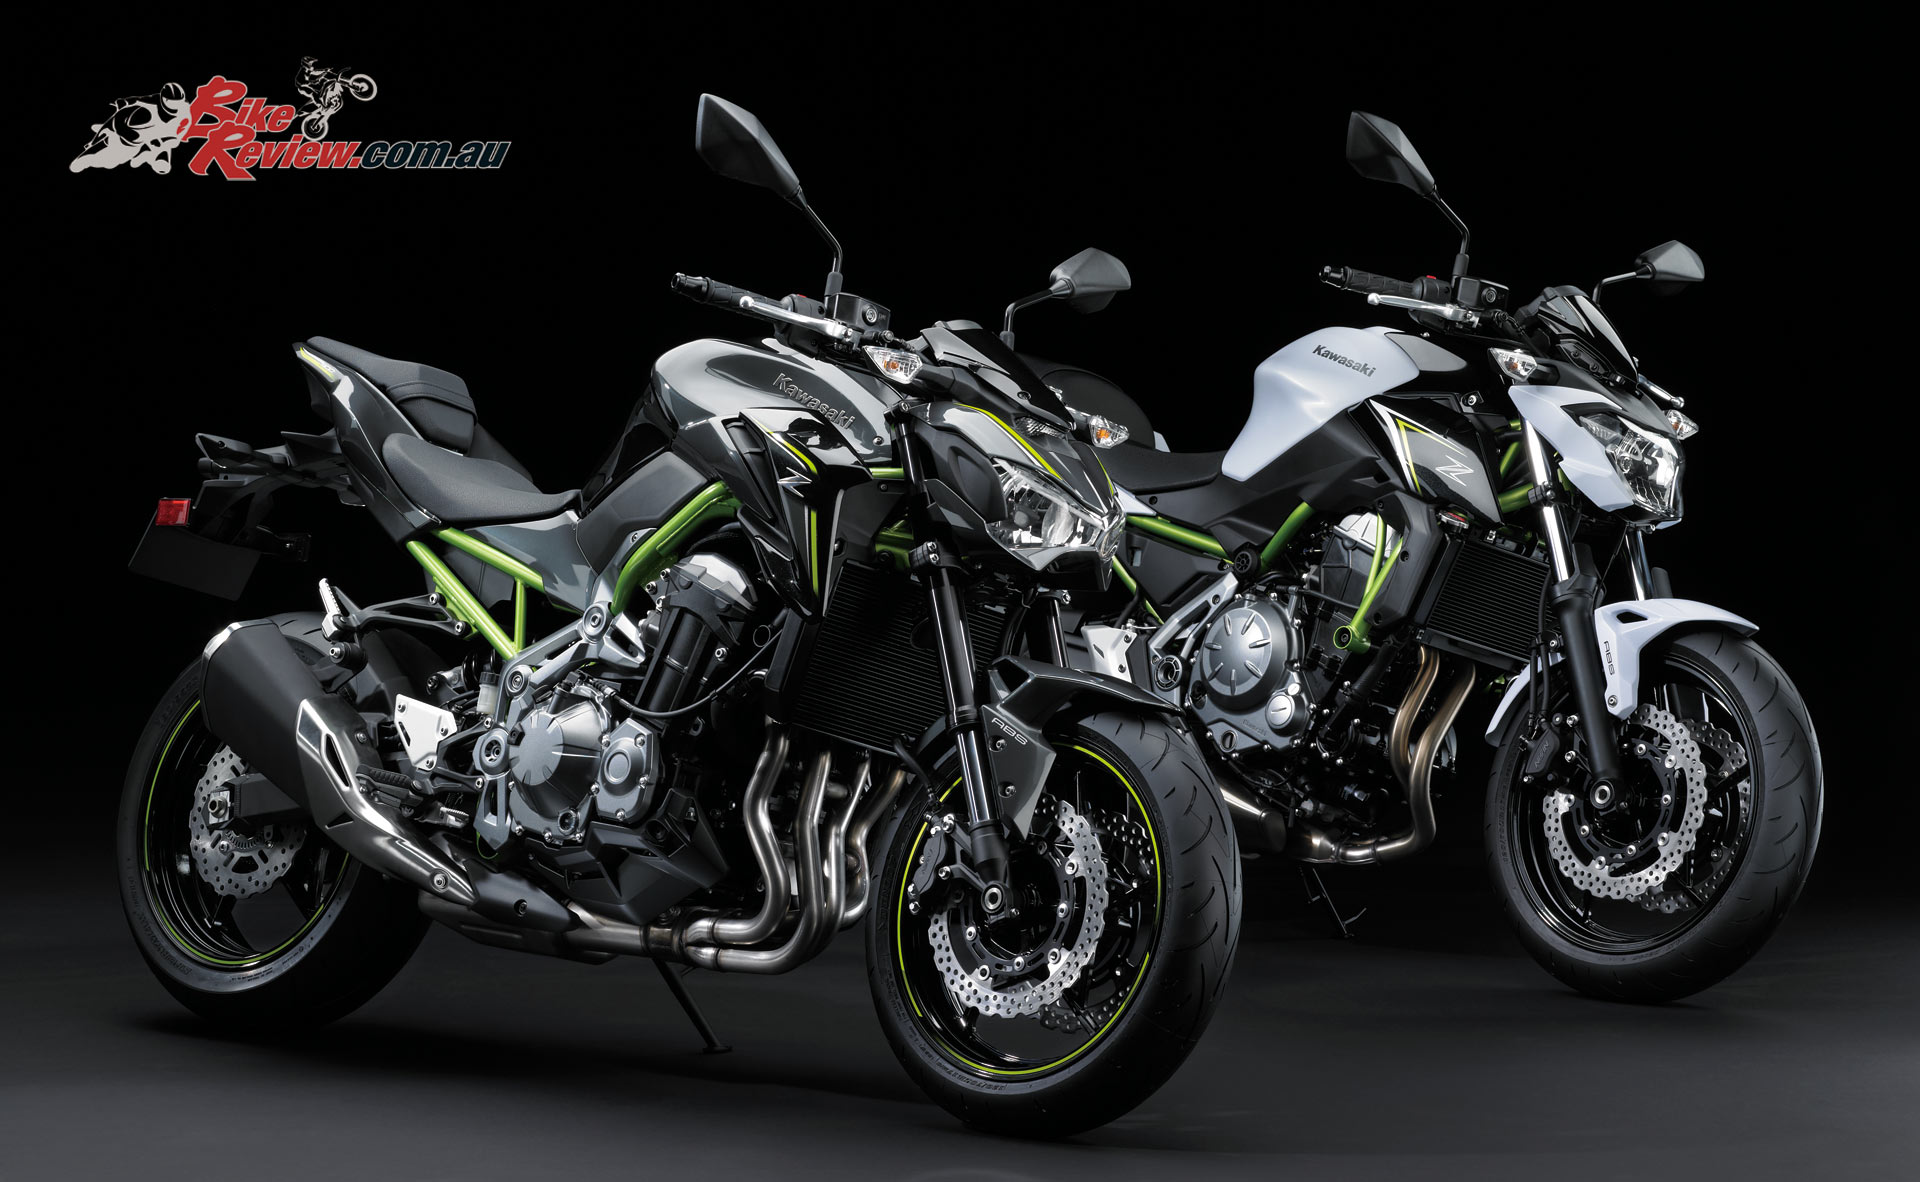 2017 Kawasaki Z900 and Z650